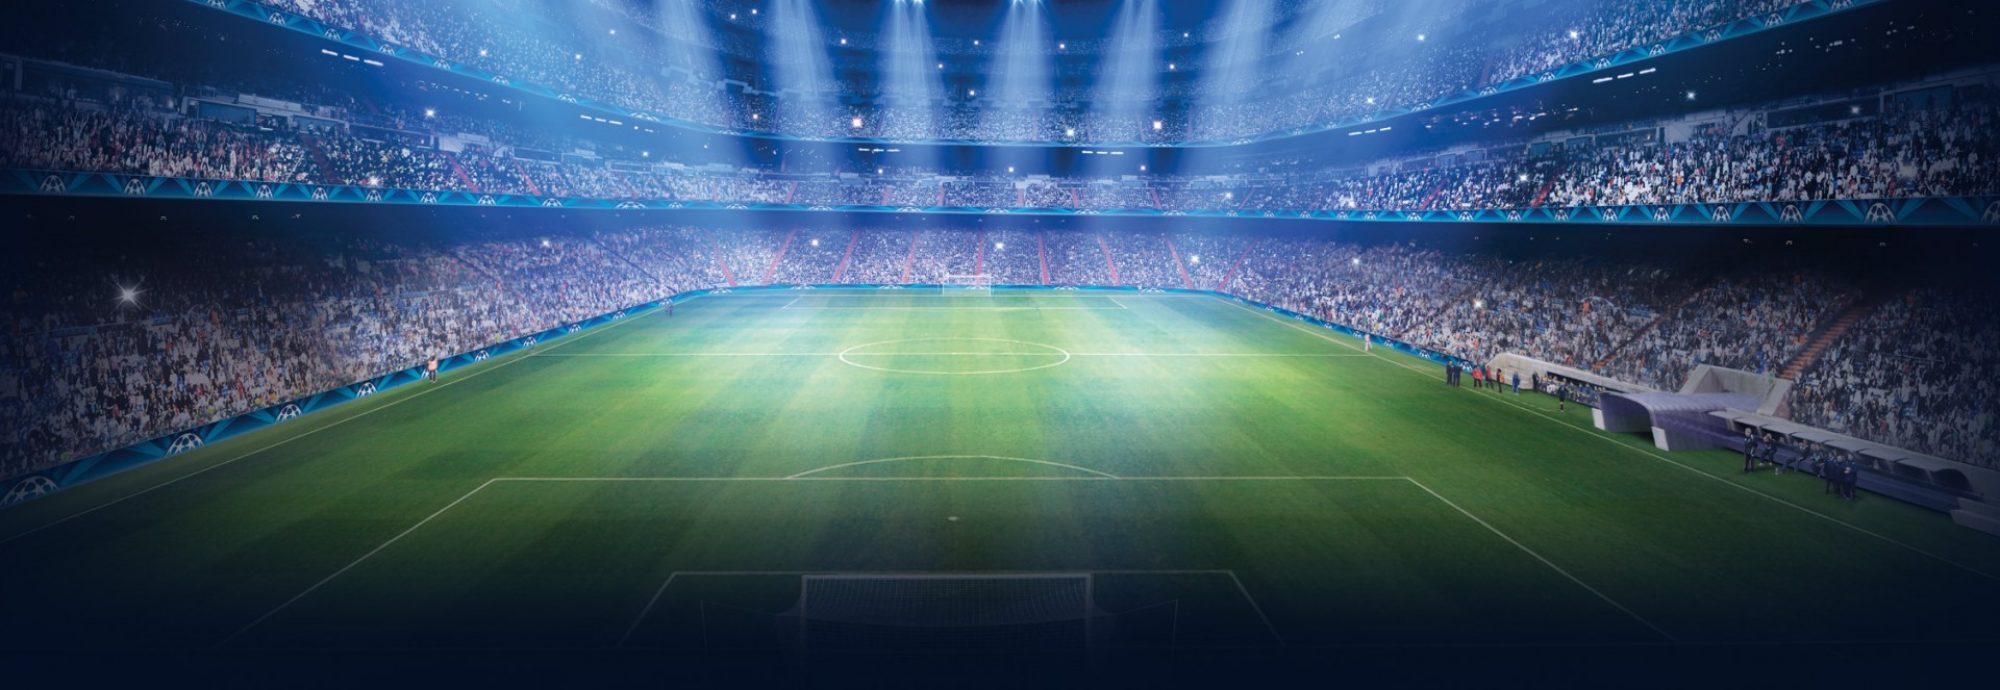 cropped uefa champions league stadium